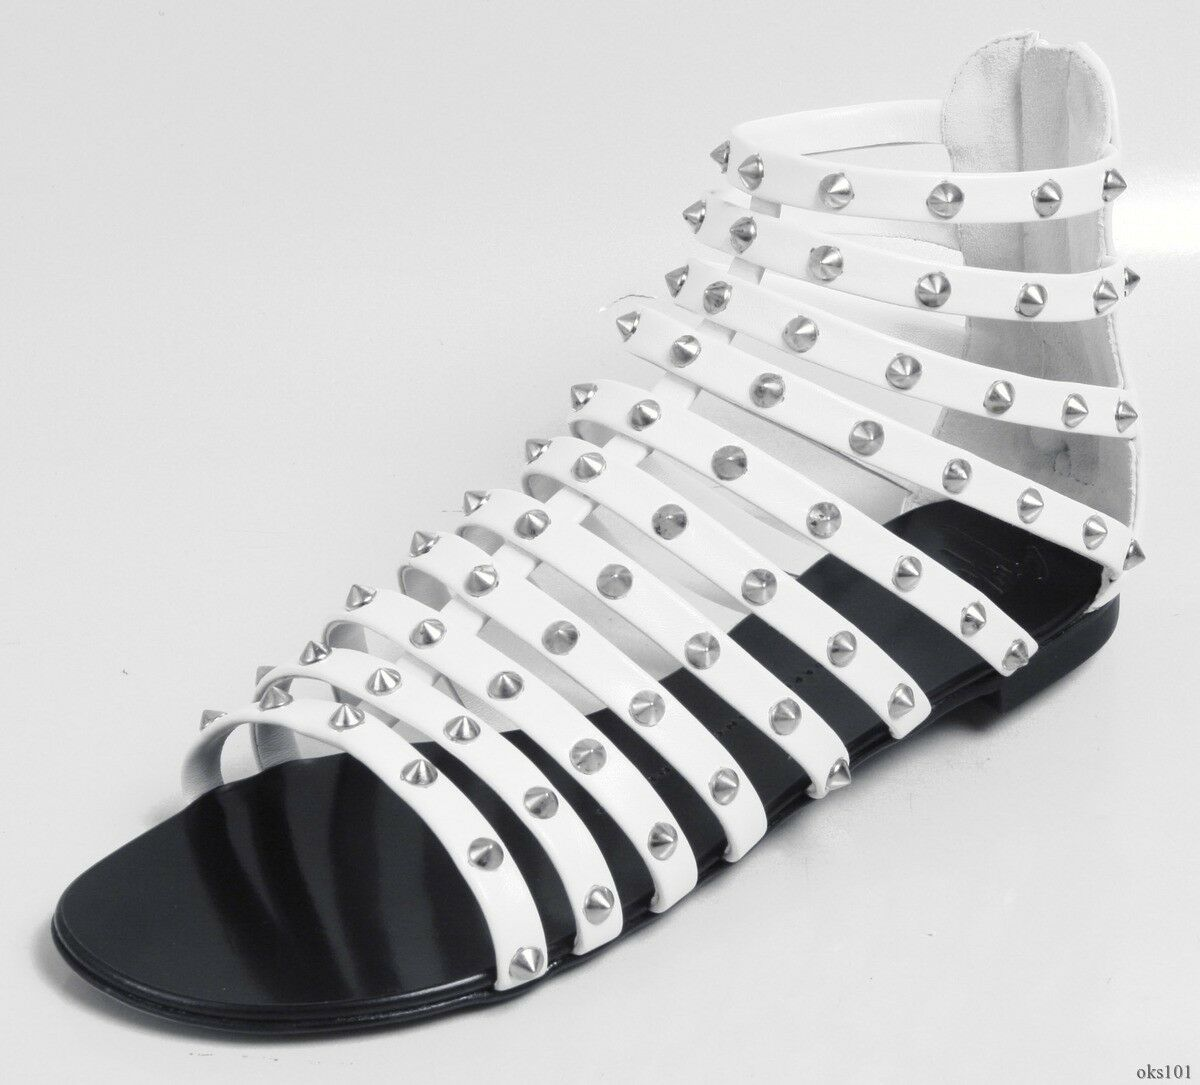 New  995 Giuseppe ZANOTTI white SPIKED STUDDED strappy sandal flats Scarpe - HOT